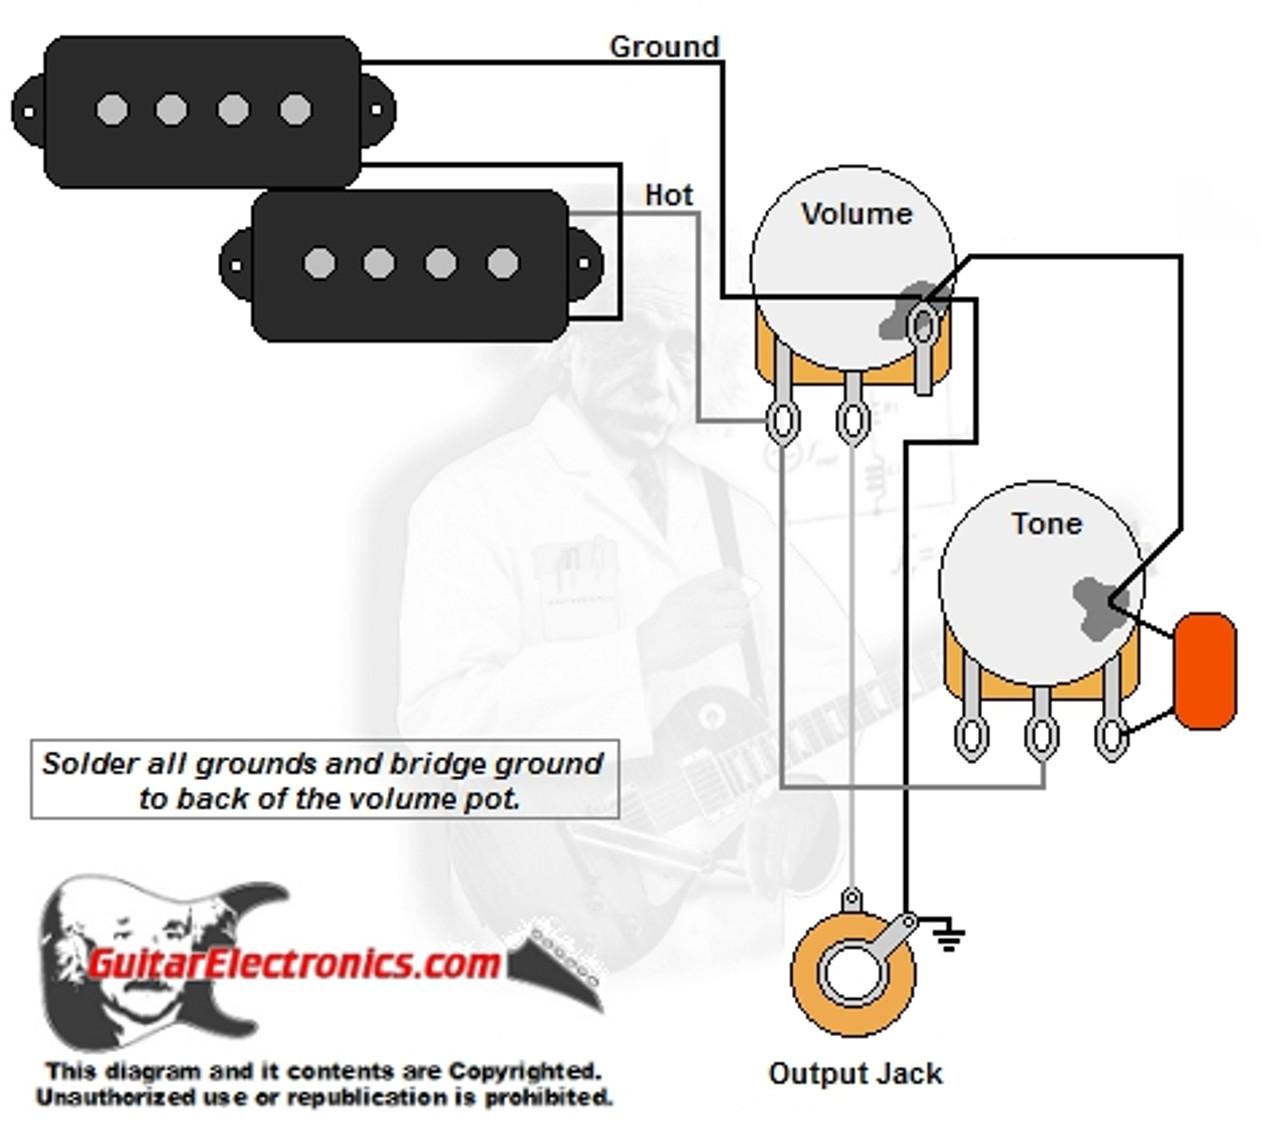 archtop wiring diagram wiring diagram technic mix p bass style wiring diagramarchtop wiring diagram 11 [ 1280 x 1126 Pixel ]